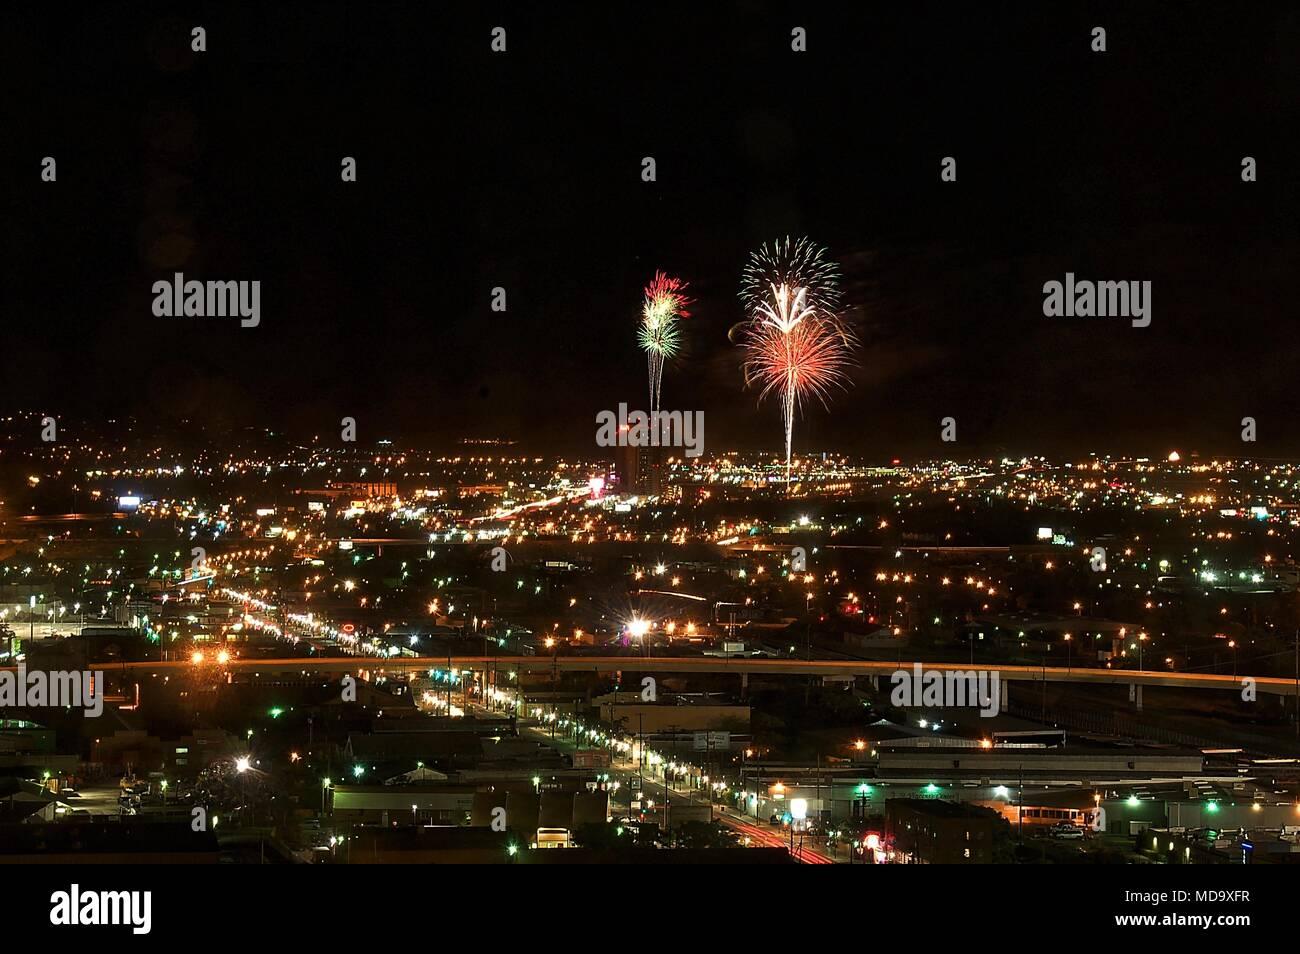 Reno Sparks Stock Photos & Reno Sparks Stock Images - Alamy